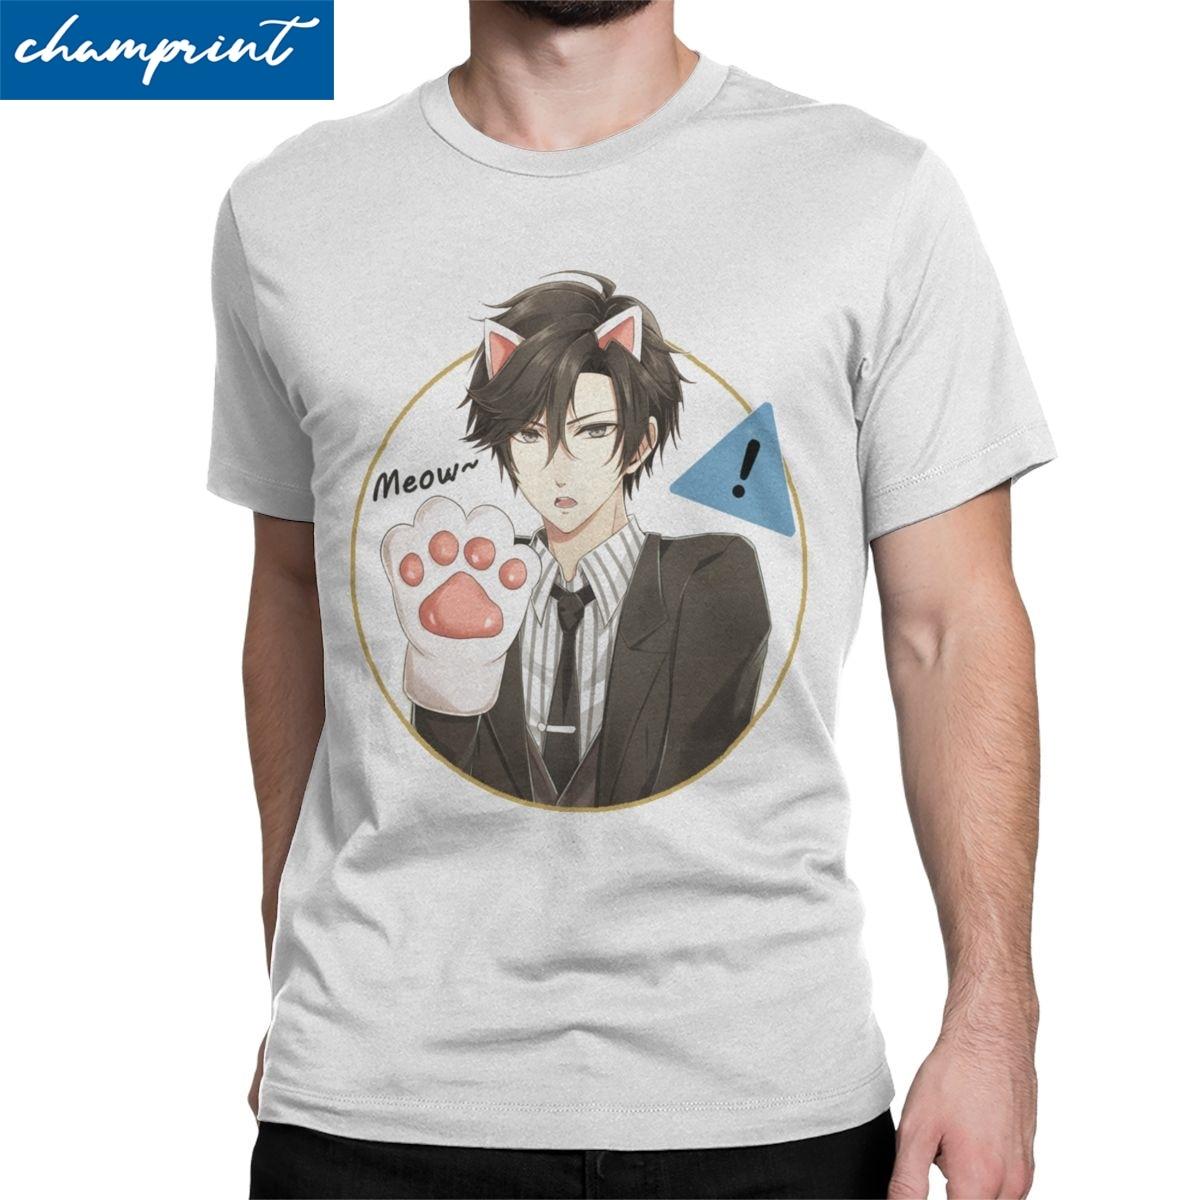 Jumin Men T Shirt Mystic Messenger MM BG Otome Game Crazy Tee Shirt Short Sleeve Round Collar T-Shirt Cotton Gift Idea Clothing